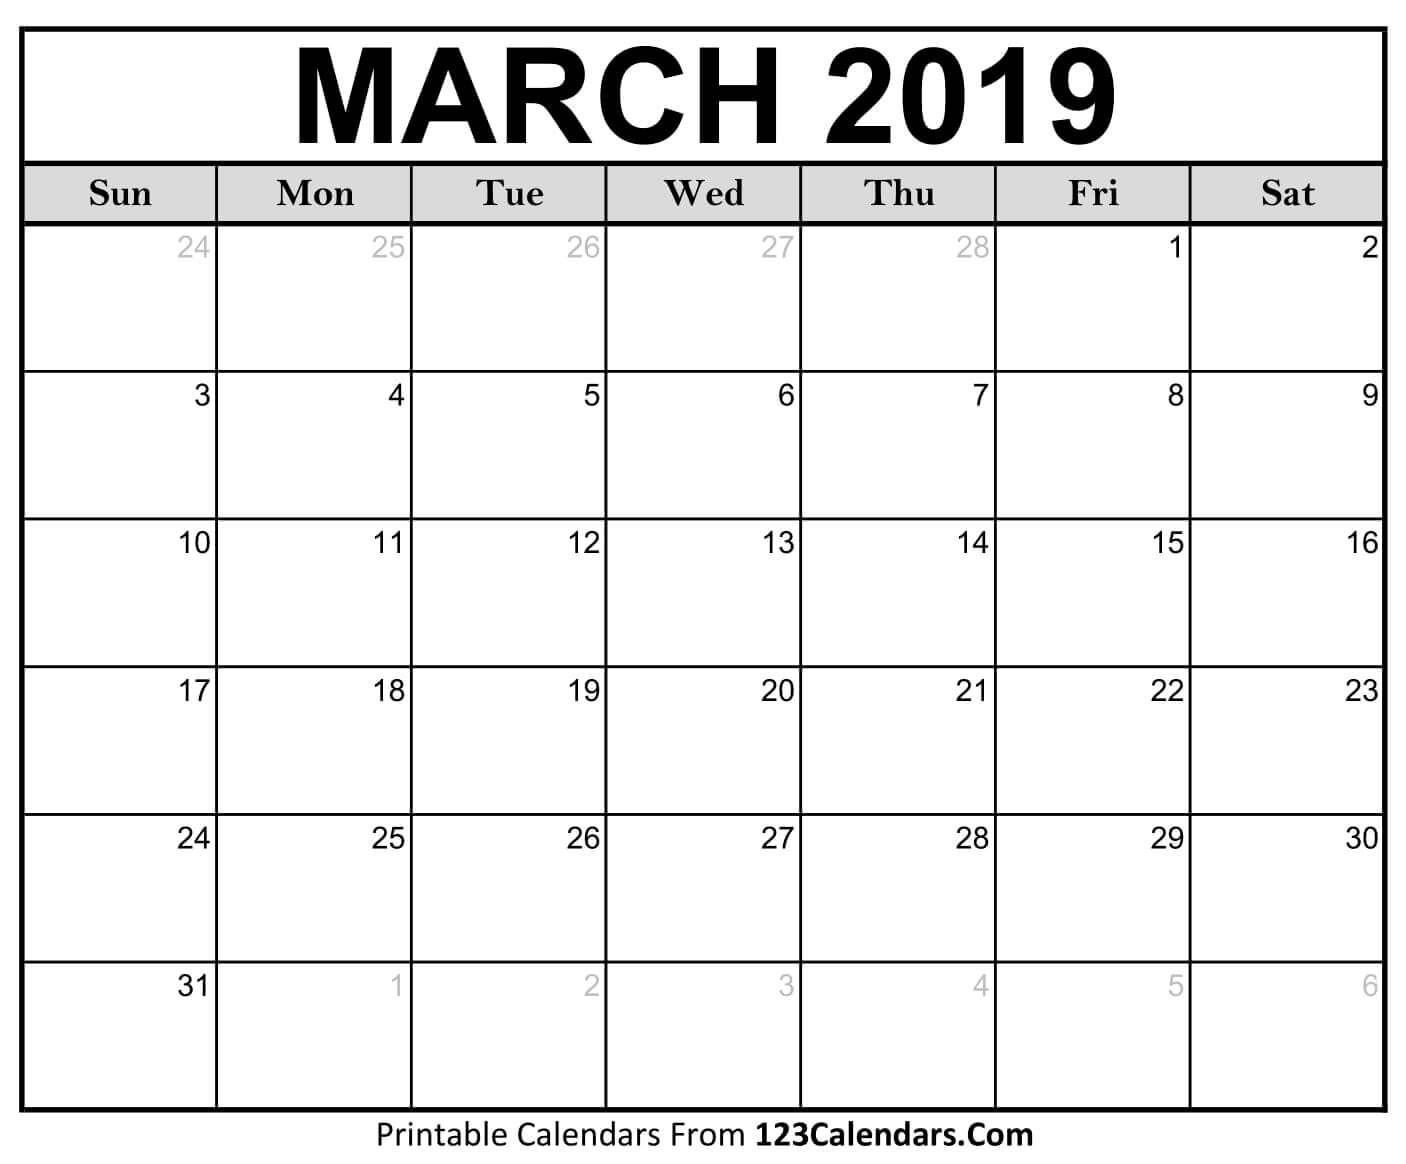 Printable March 2019 Calendar Templates - 123Calendars Free